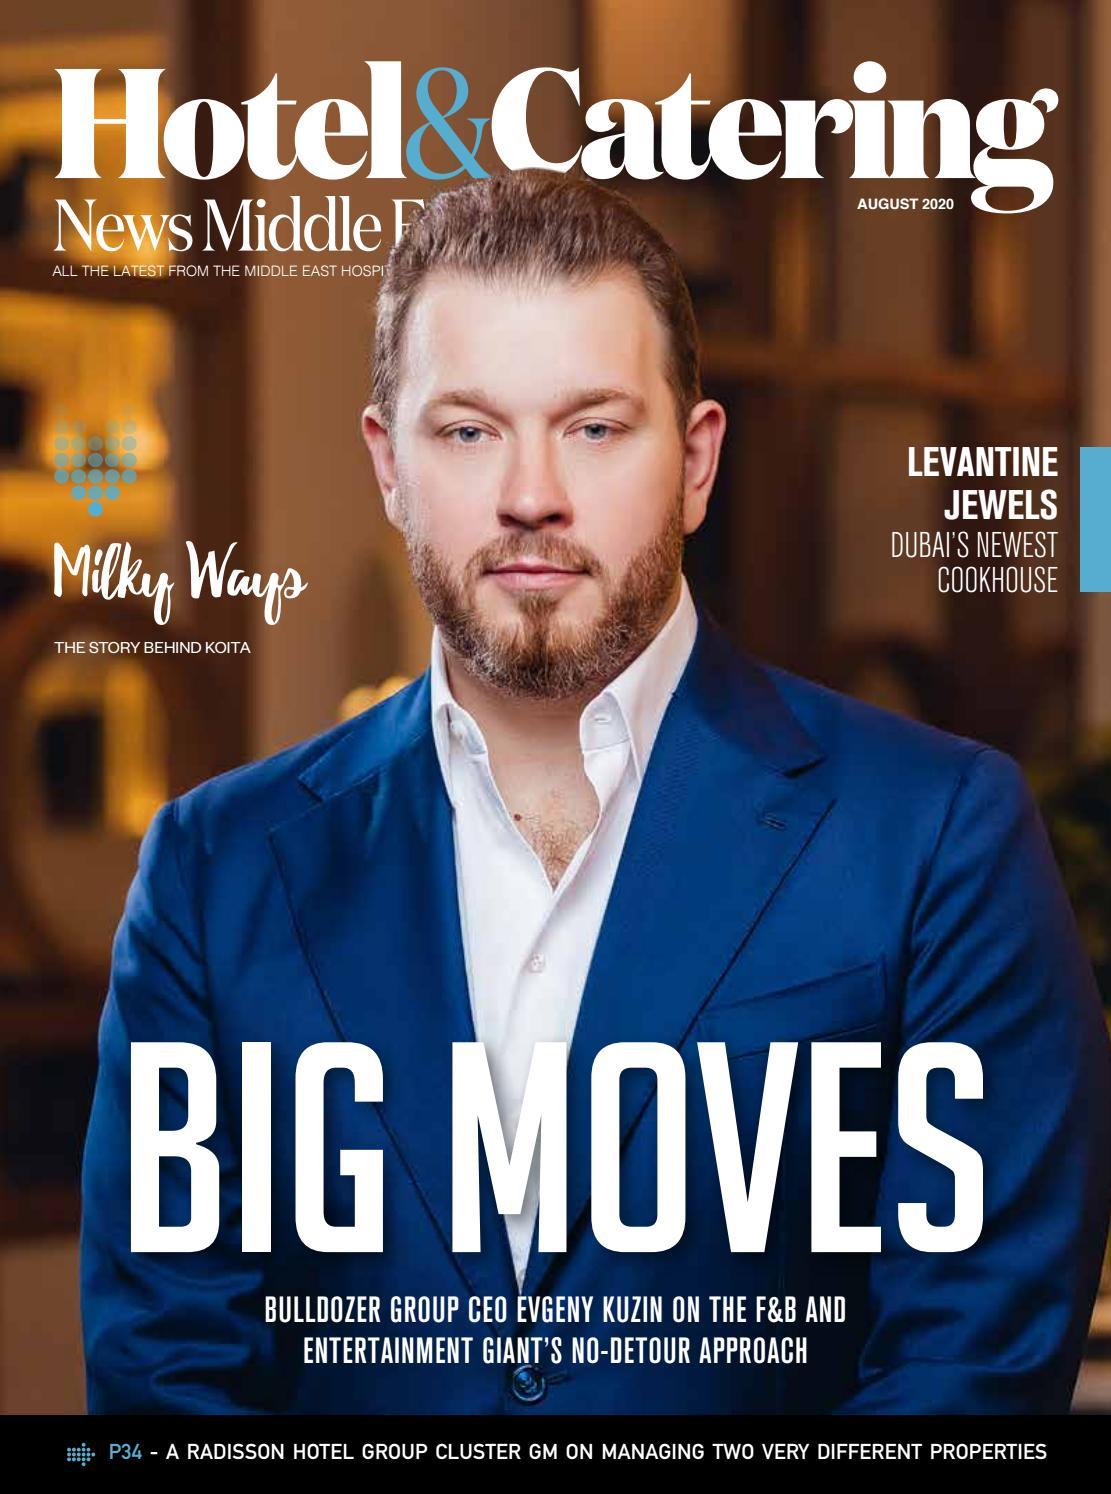 https://www.hotelnewsme.com/digital-magazine/hotel-catering-news-me-august-2020/